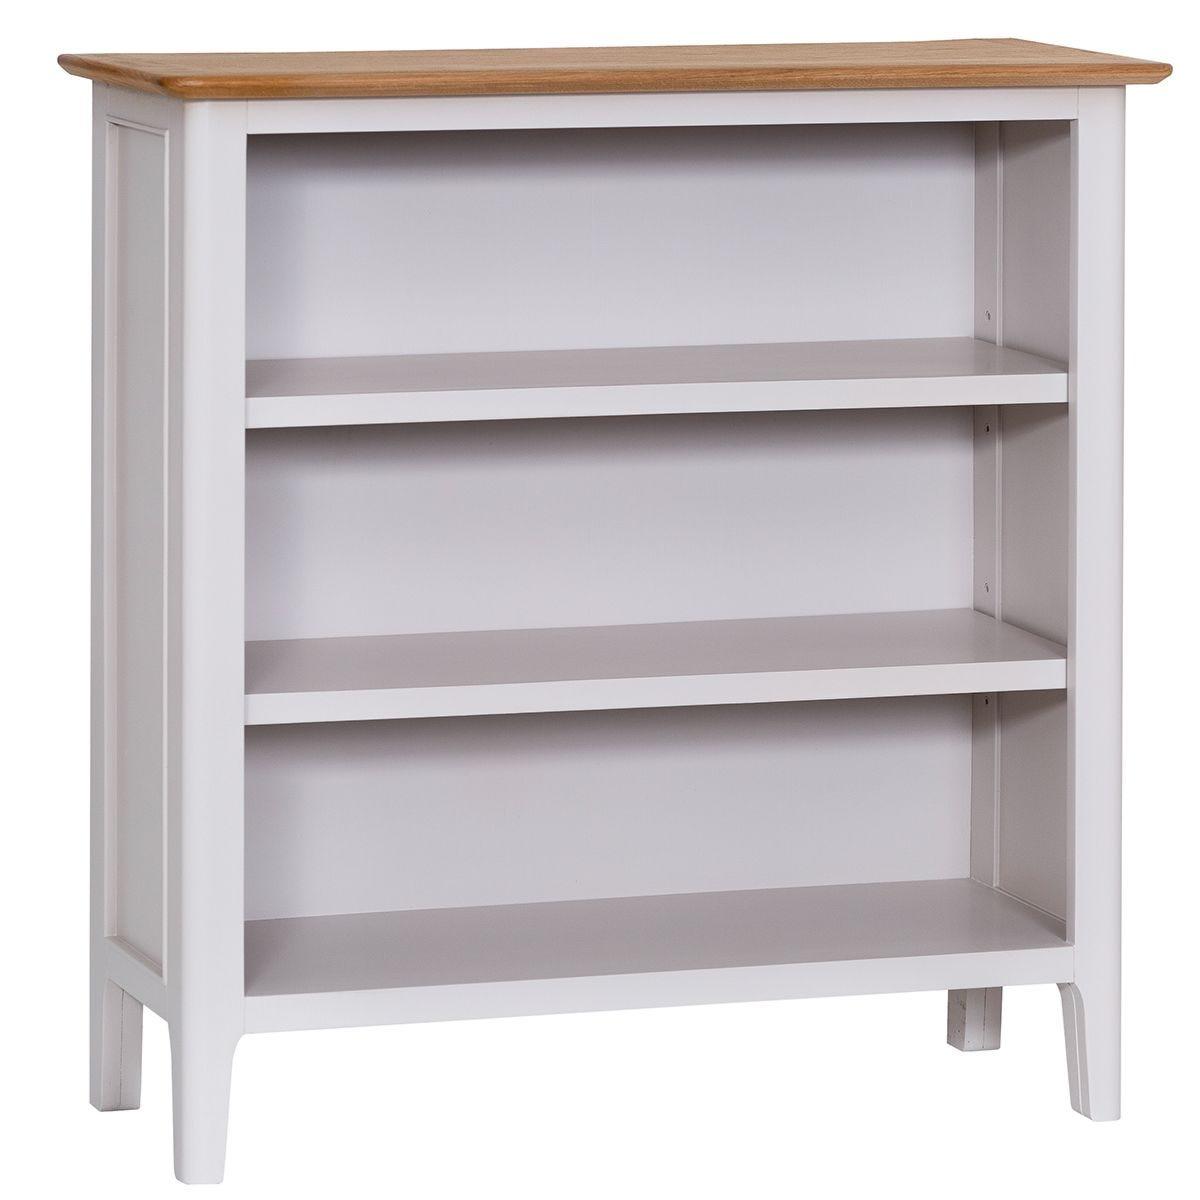 Notswood Wooden Bookcase